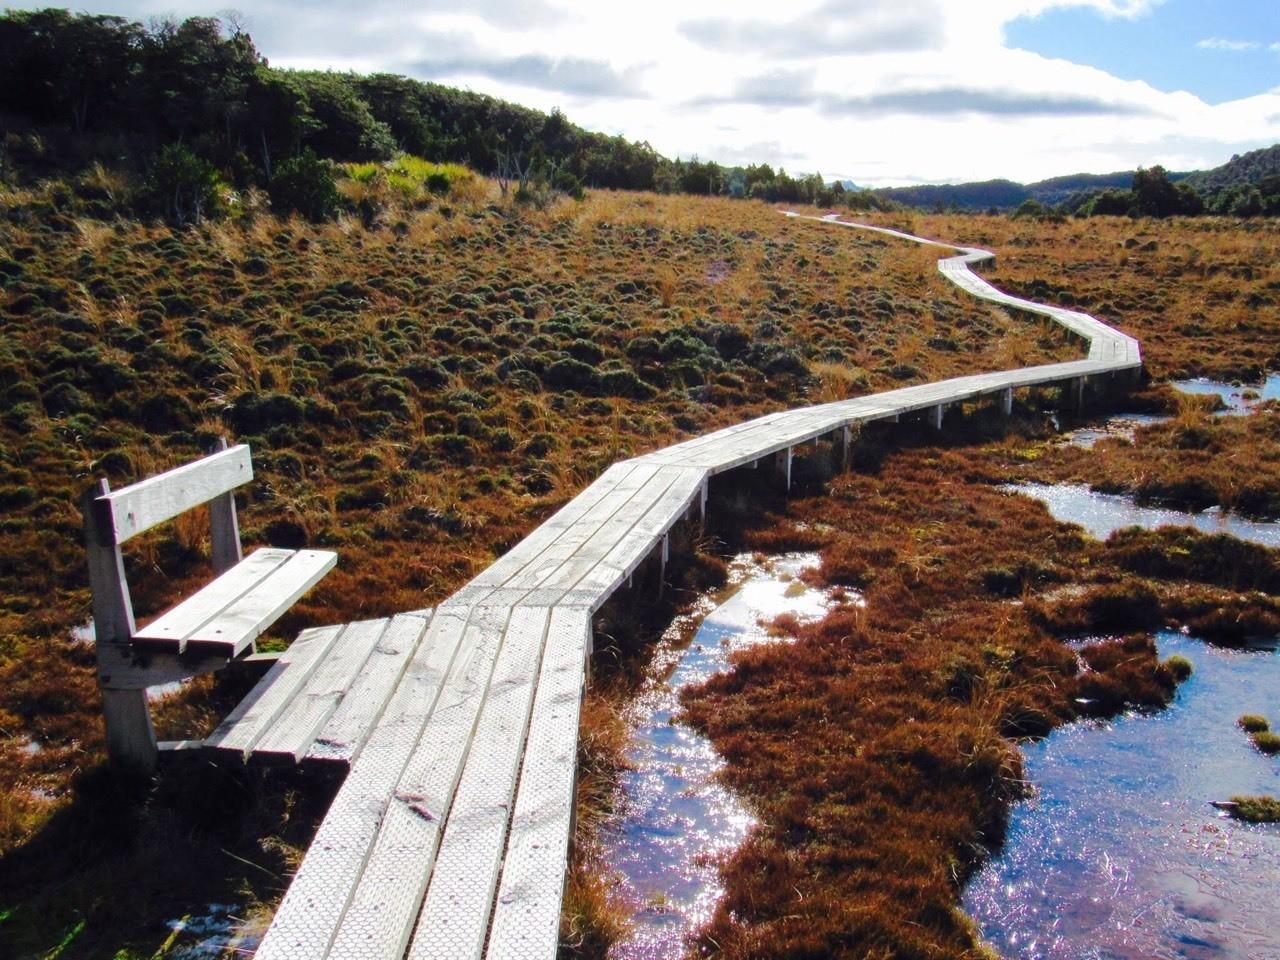 Waitonga Falls Track - Mt Ruapehu walking track, central North island, New Zealand.